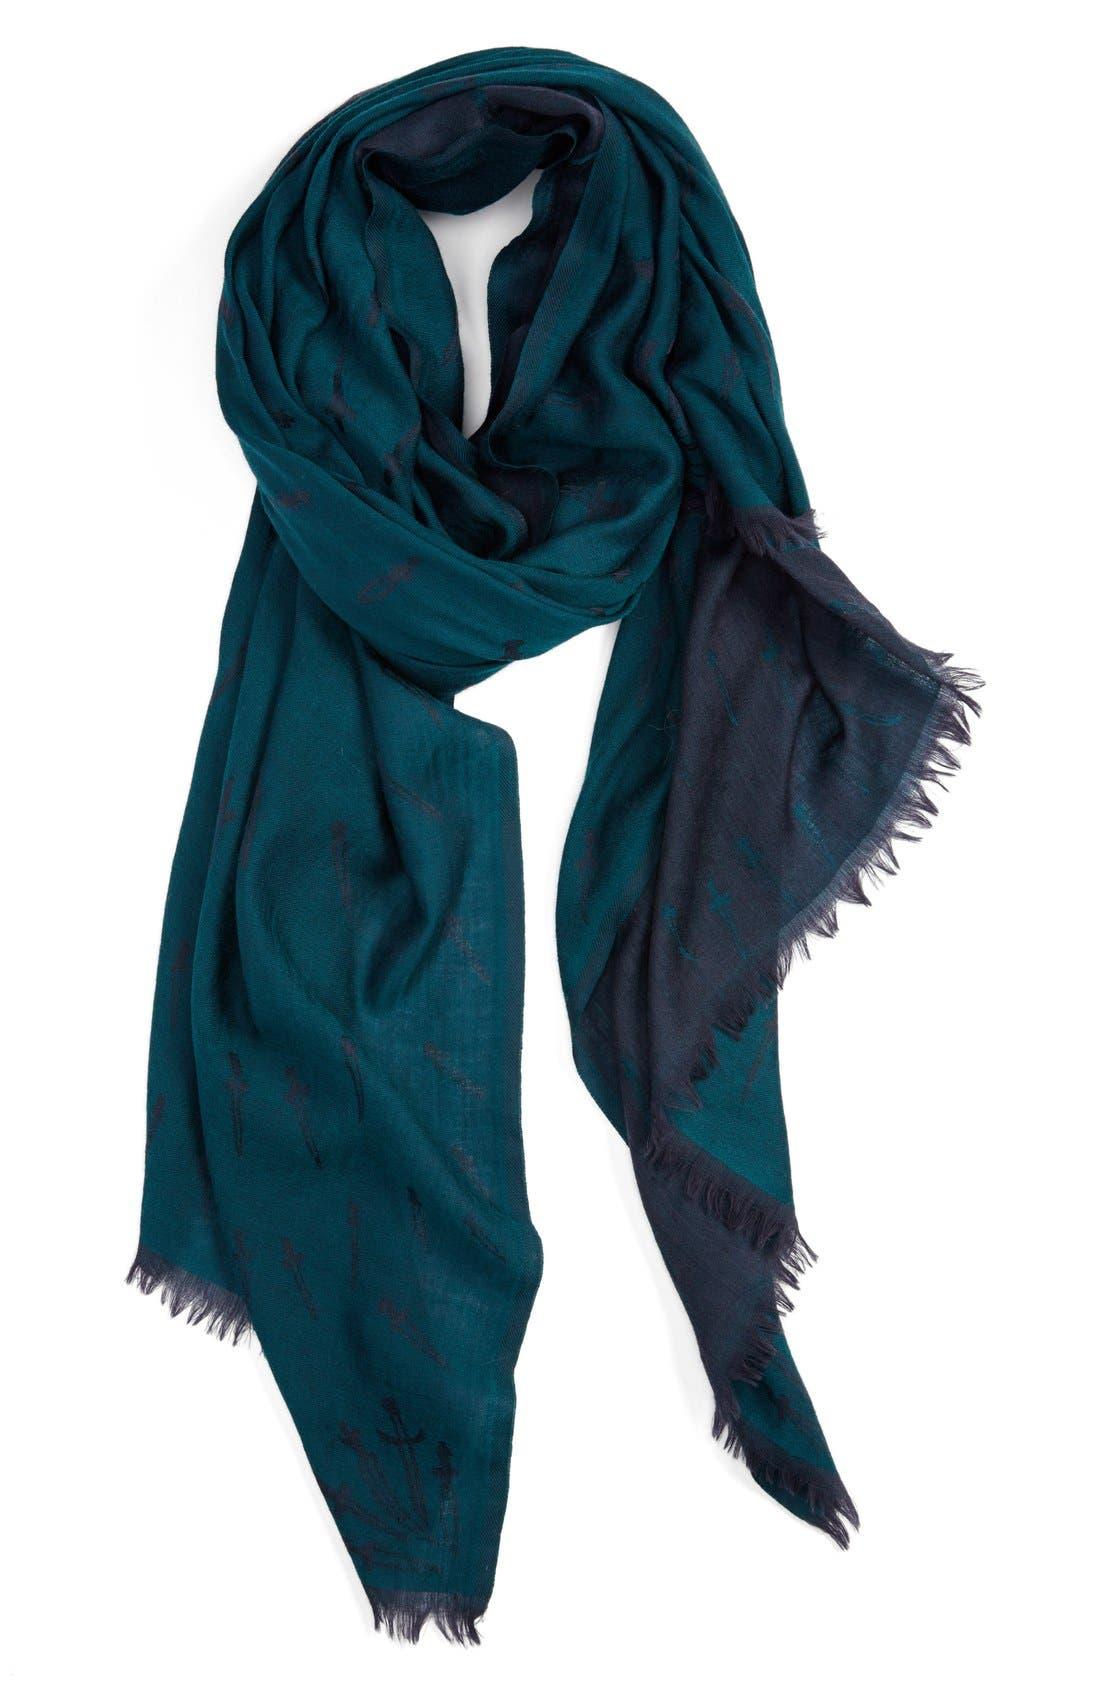 Main Image - rag & bone 'Dagger' Wool Jacquard Scarf